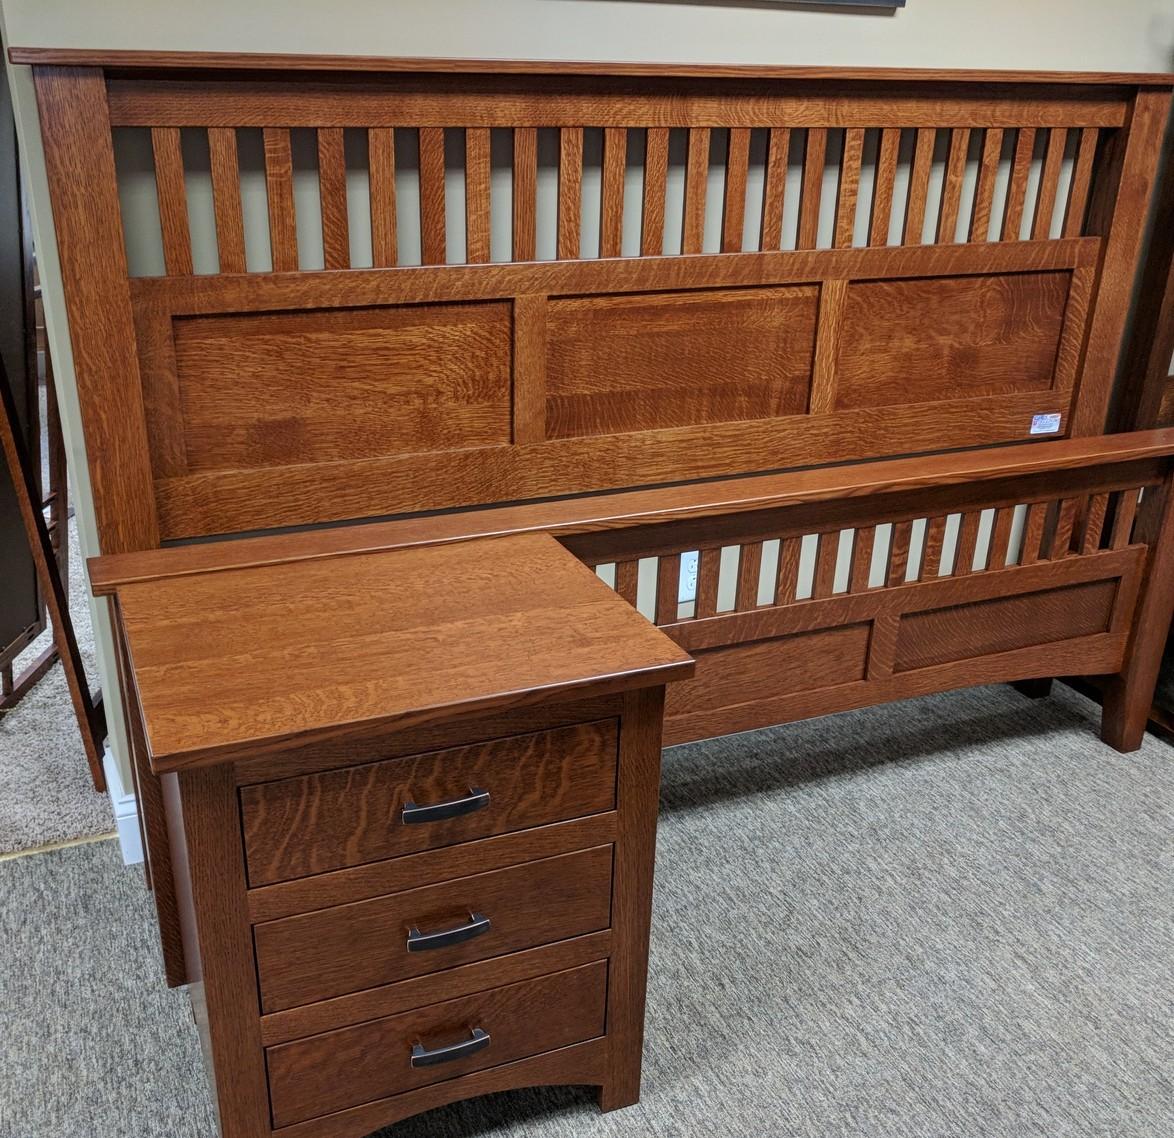 Amish Furniture Caledonia New York Gigglin Pig